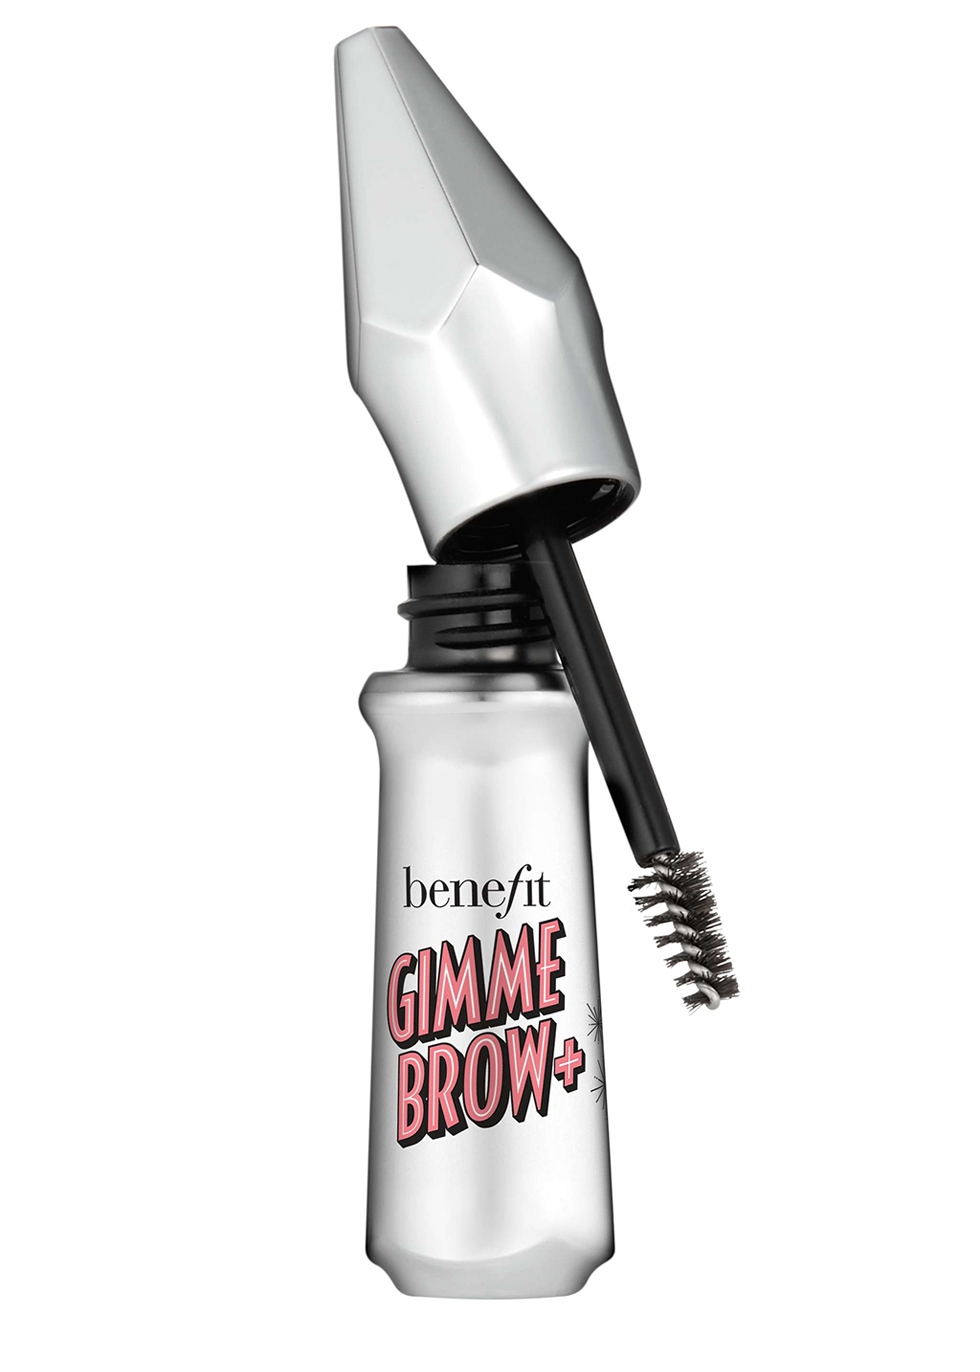 Gimme Brow+ Eyebrow Gel Travel Sized Mini - Benefit